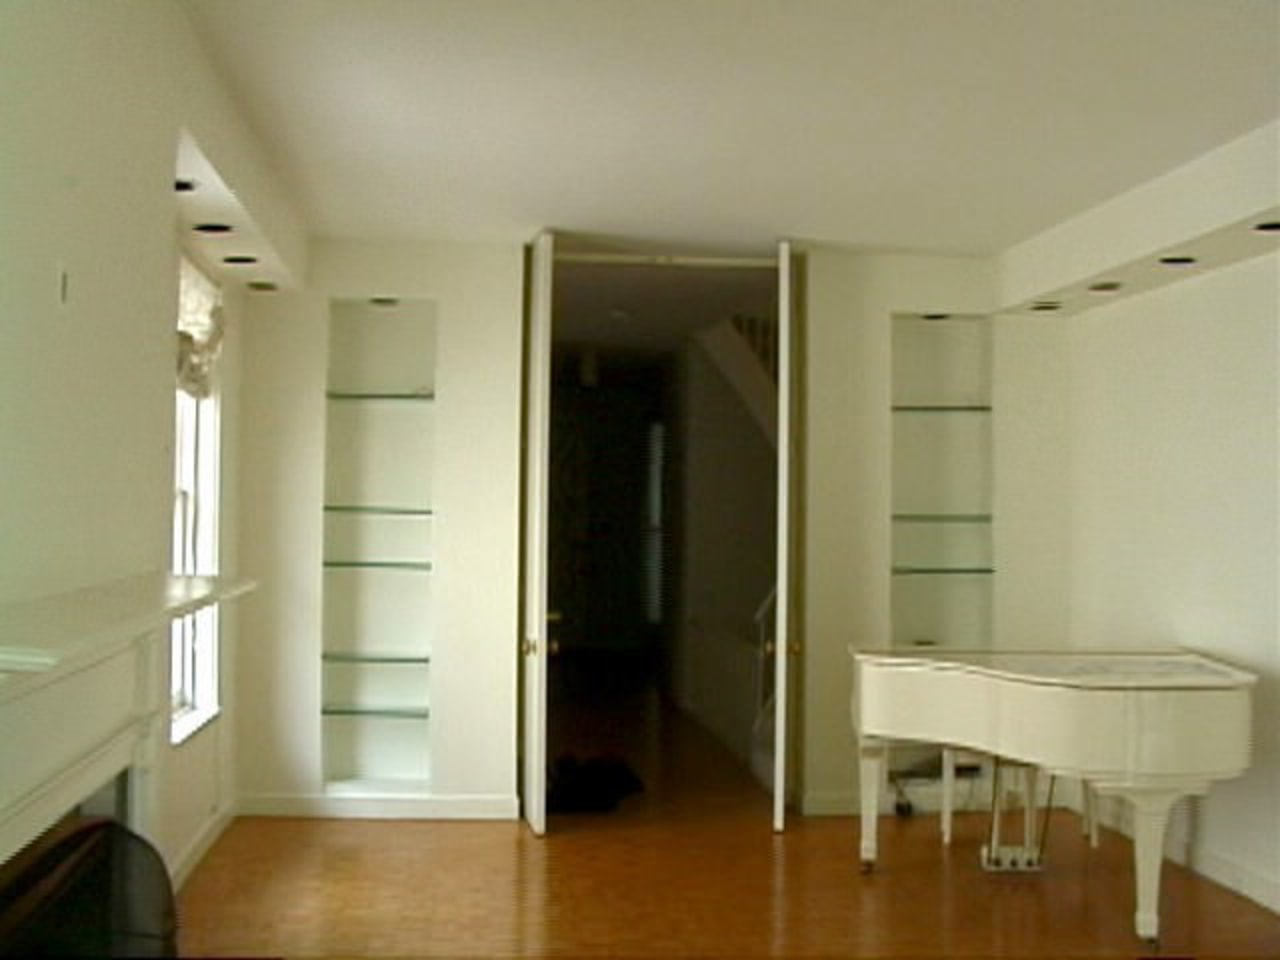 Florain has installed a glass floor panel, the apartment, ceiling, door, floor, flooring, hardwood, home, interior design, property, real estate, room, wall, window, wood flooring, orange, brown